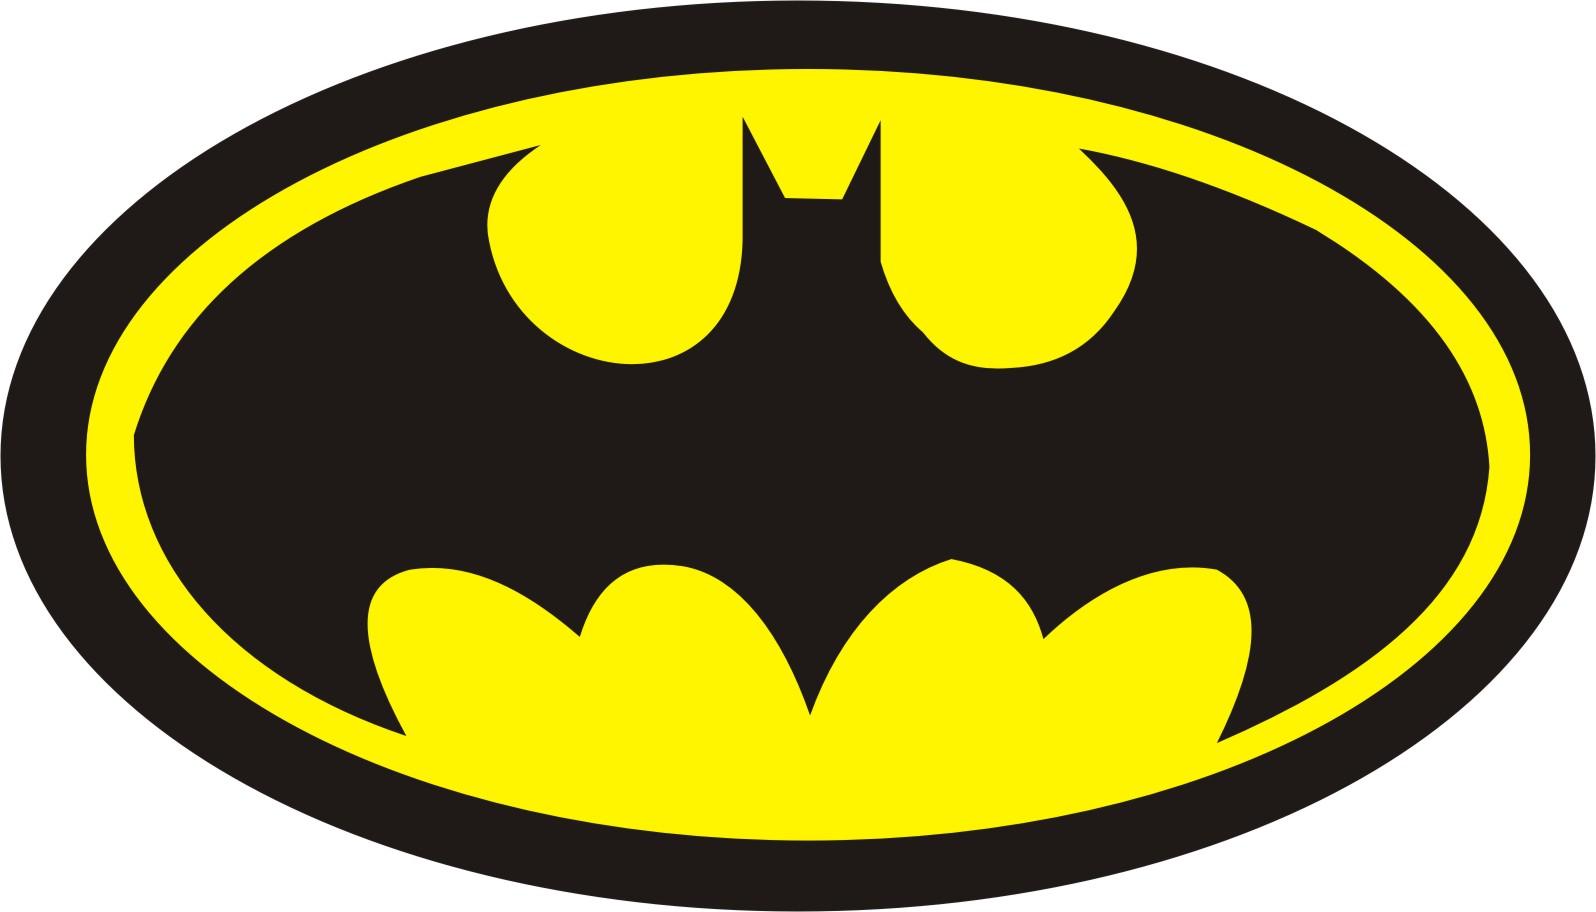 Batman clipart batman sign. Symbol outline free download